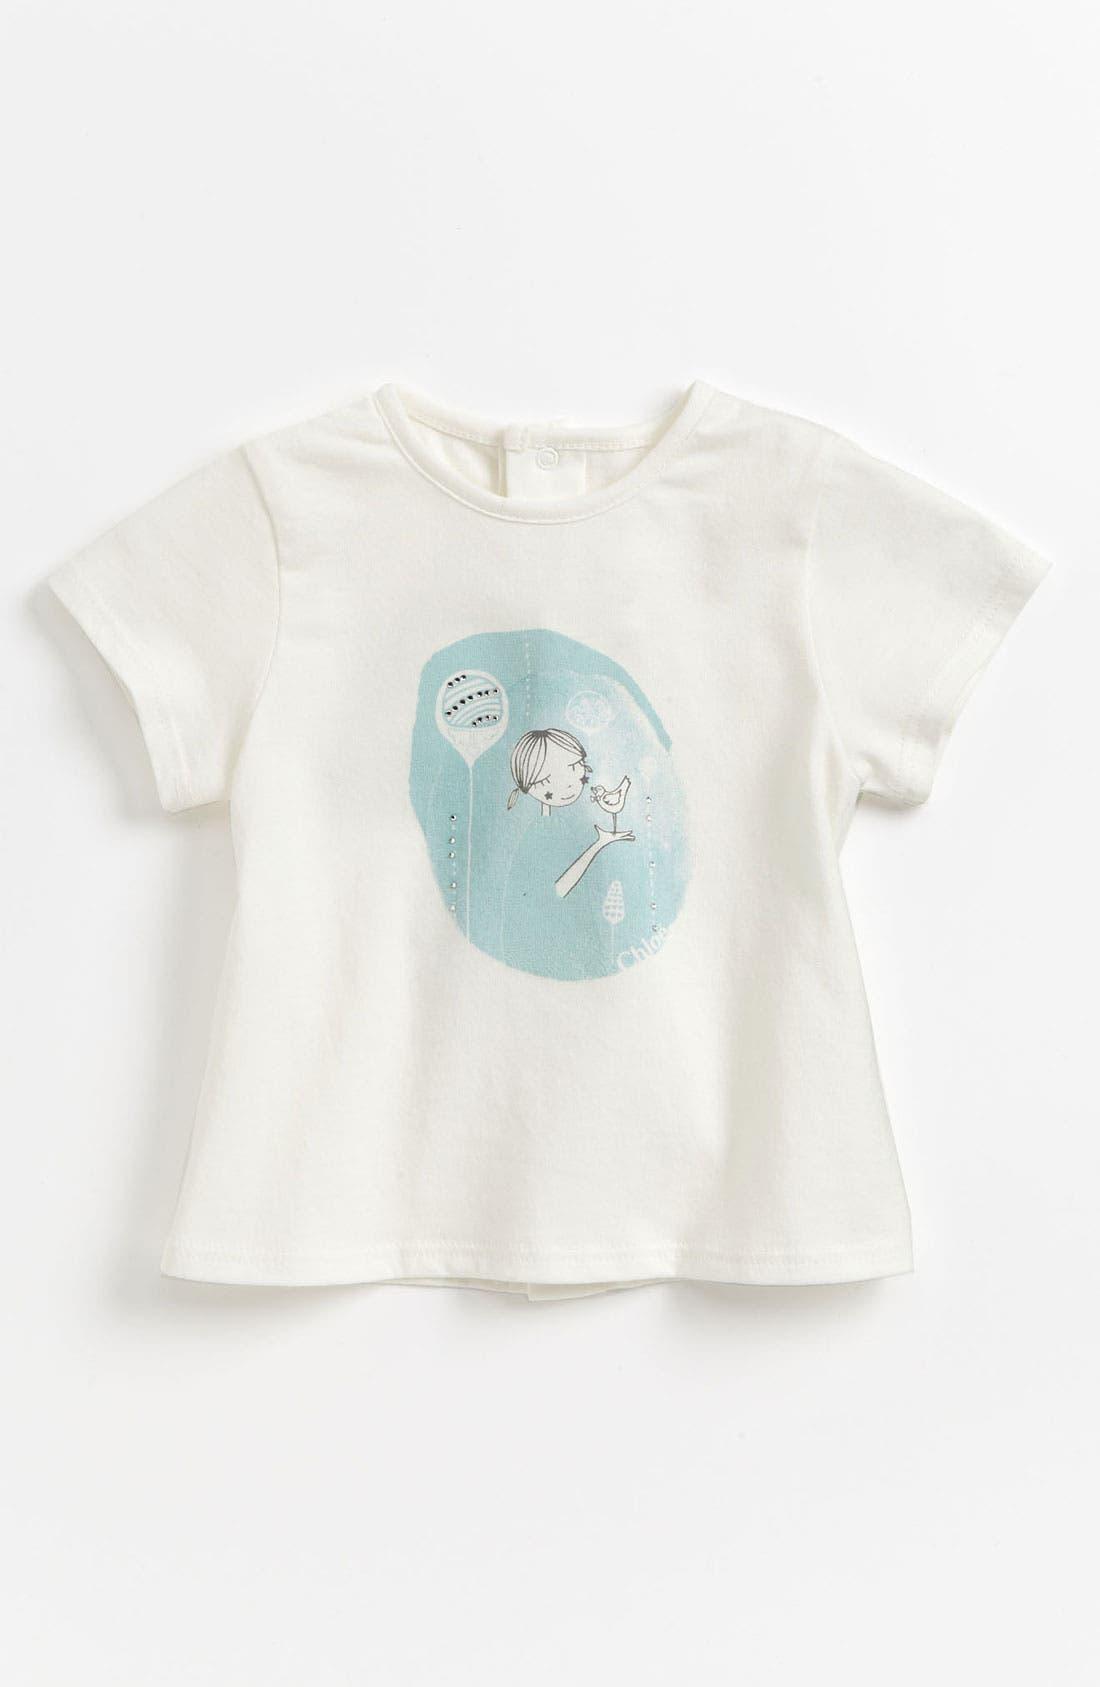 Main Image - Chloé Print Tee (Baby)